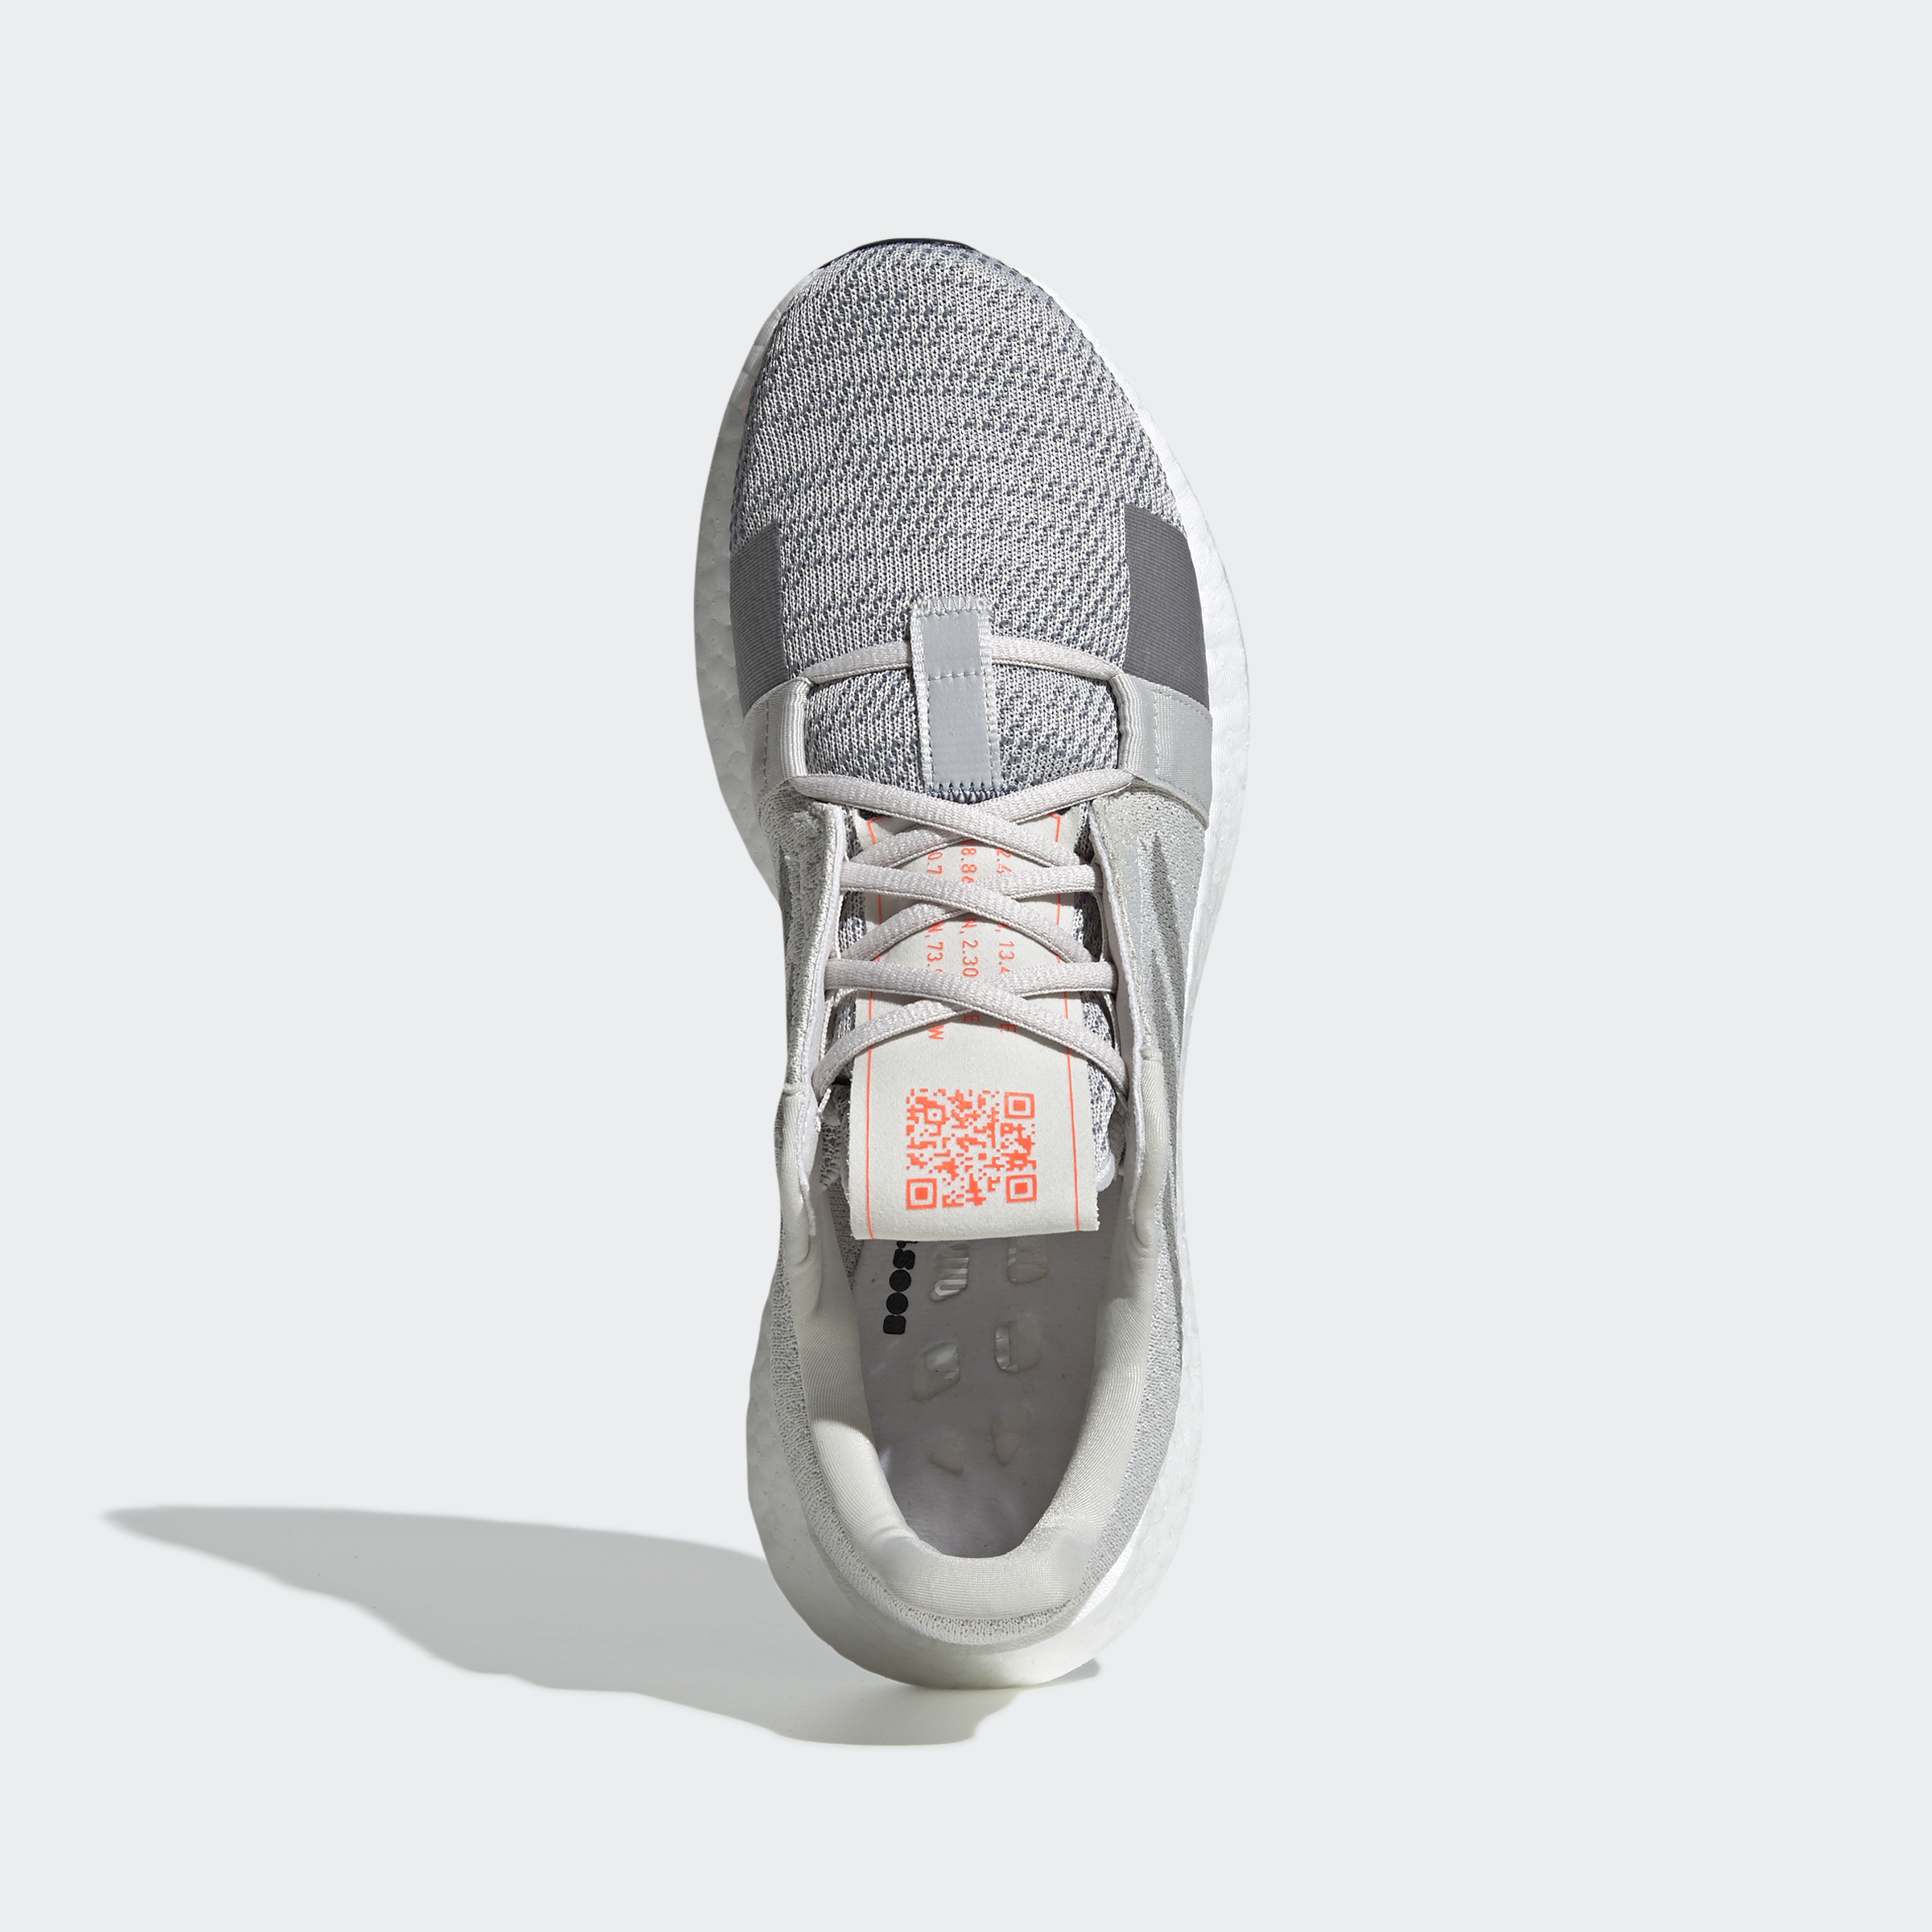 miniature 49 - adidas Senseboost Go Shoes Men's Athletic & Sneakers